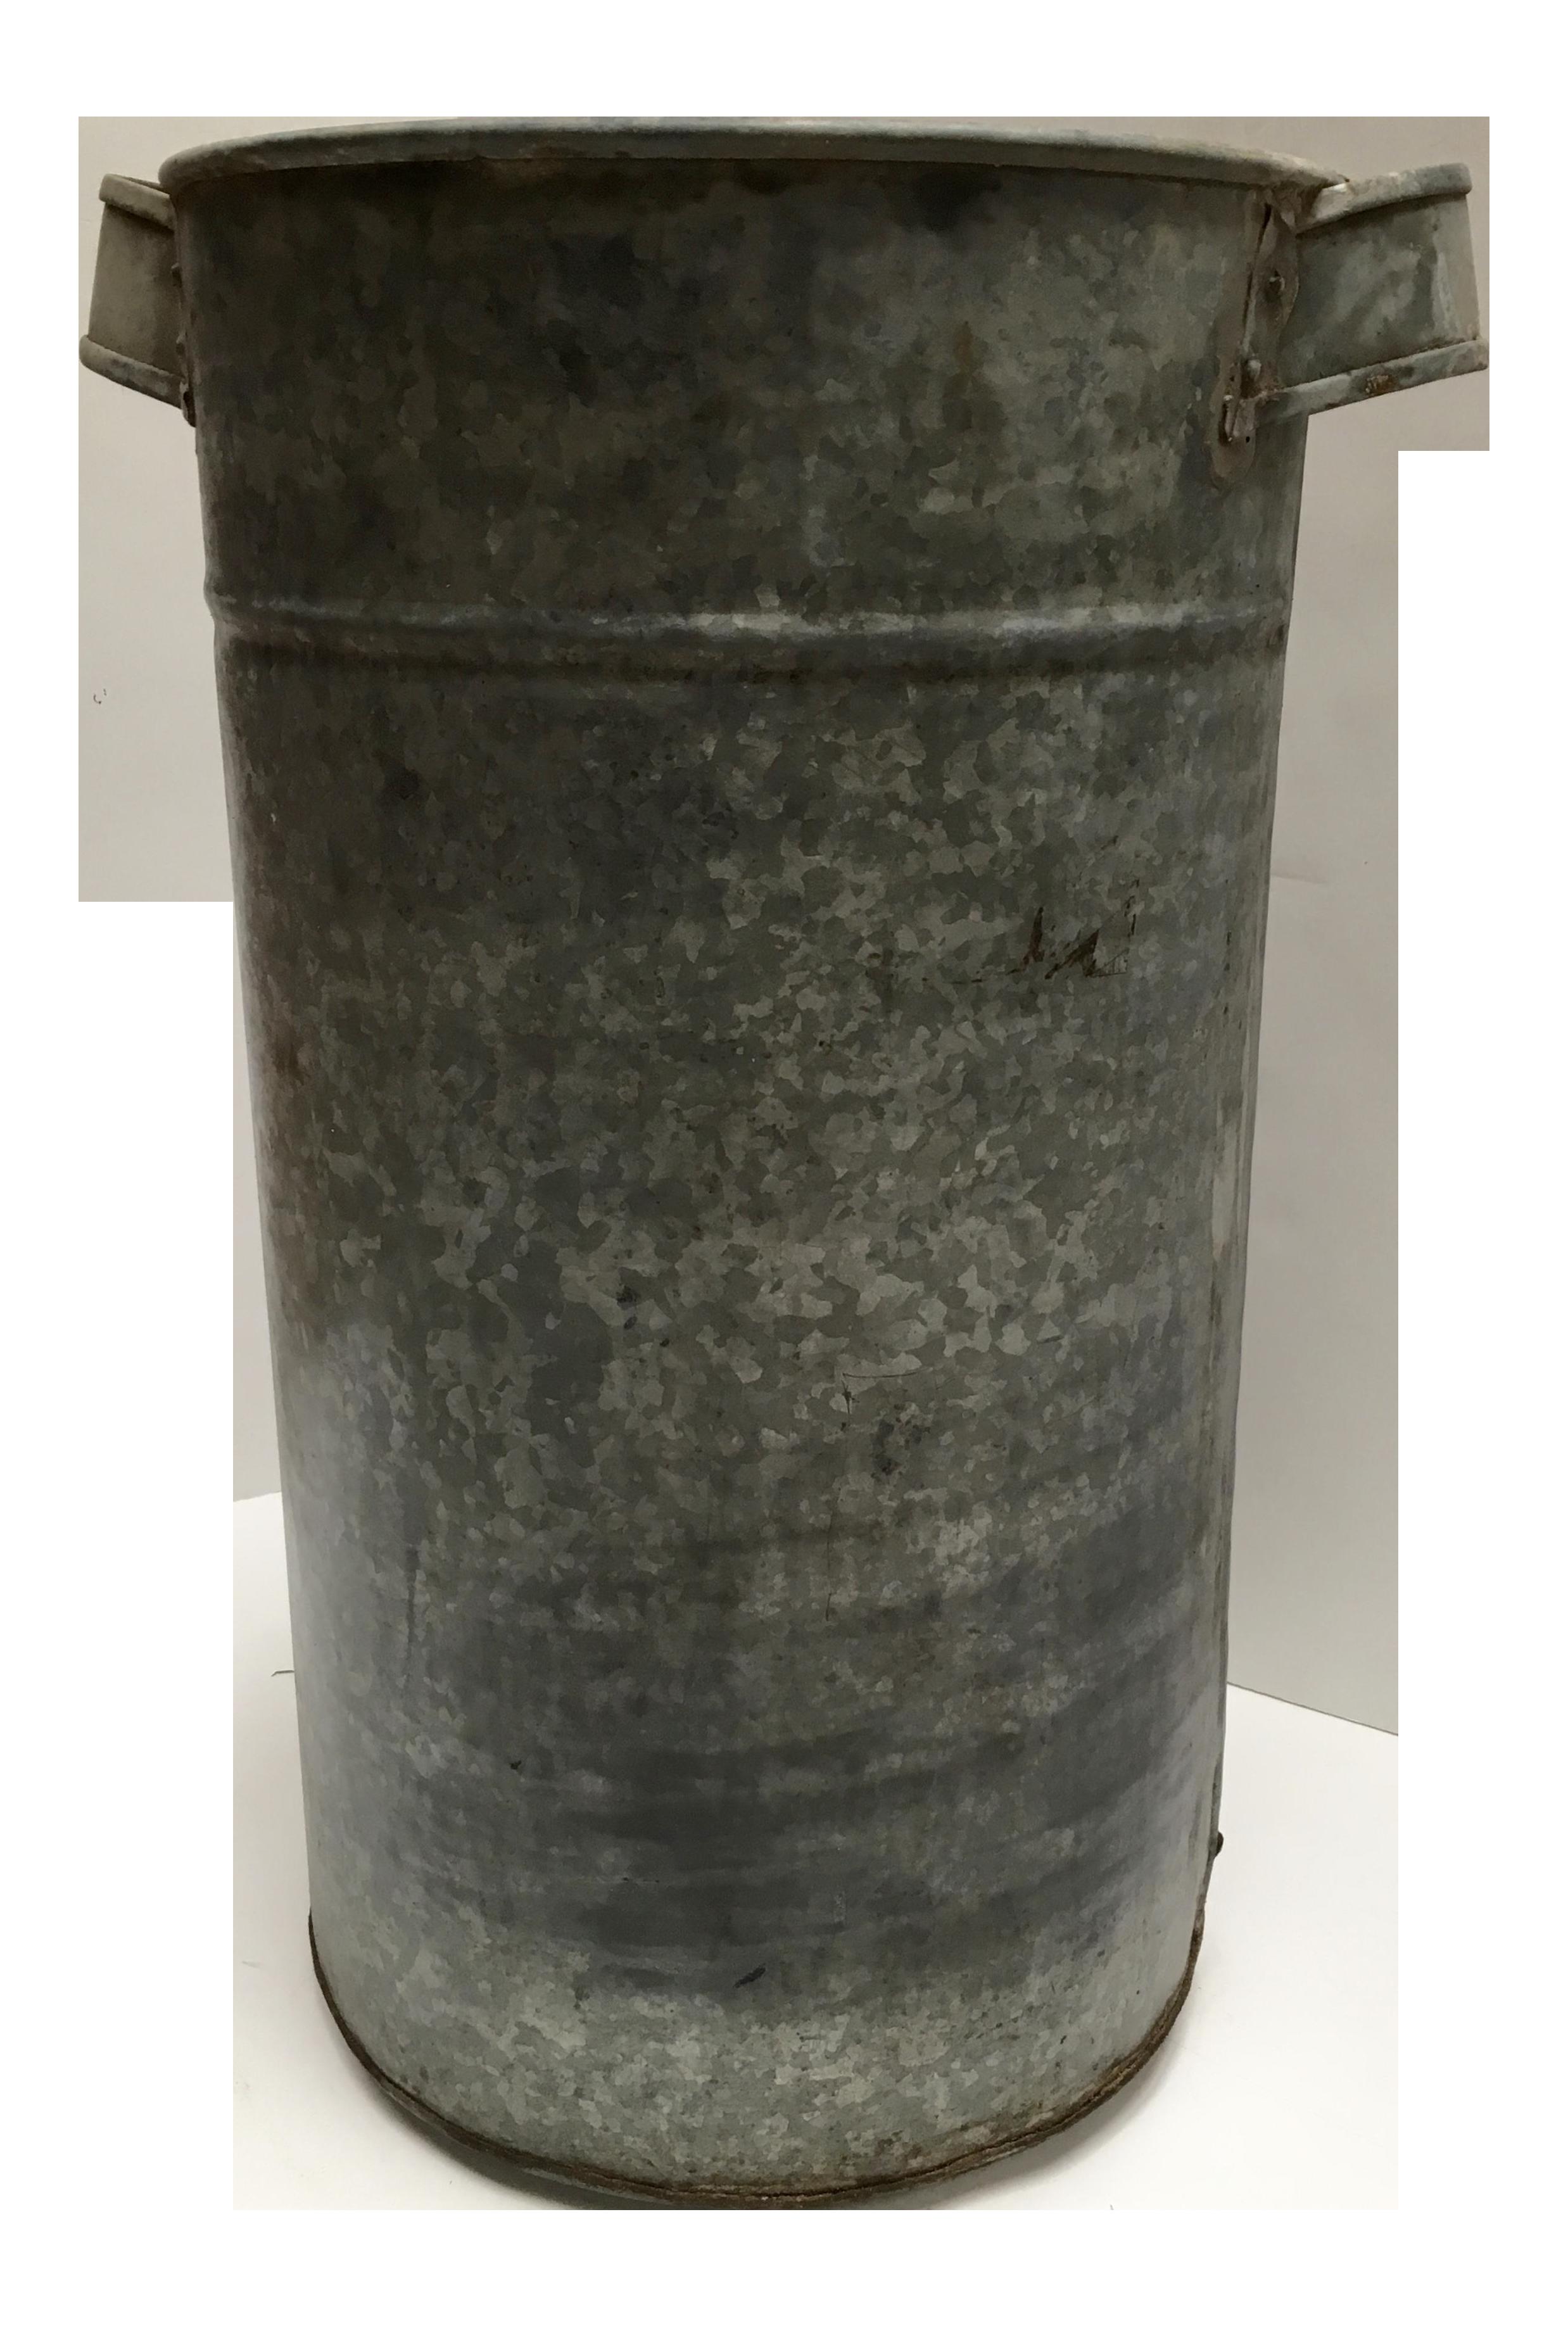 Vintage Galvanized Metal Fence Top Finial Fence Post: Vintage Round Galvanized Metal Planter